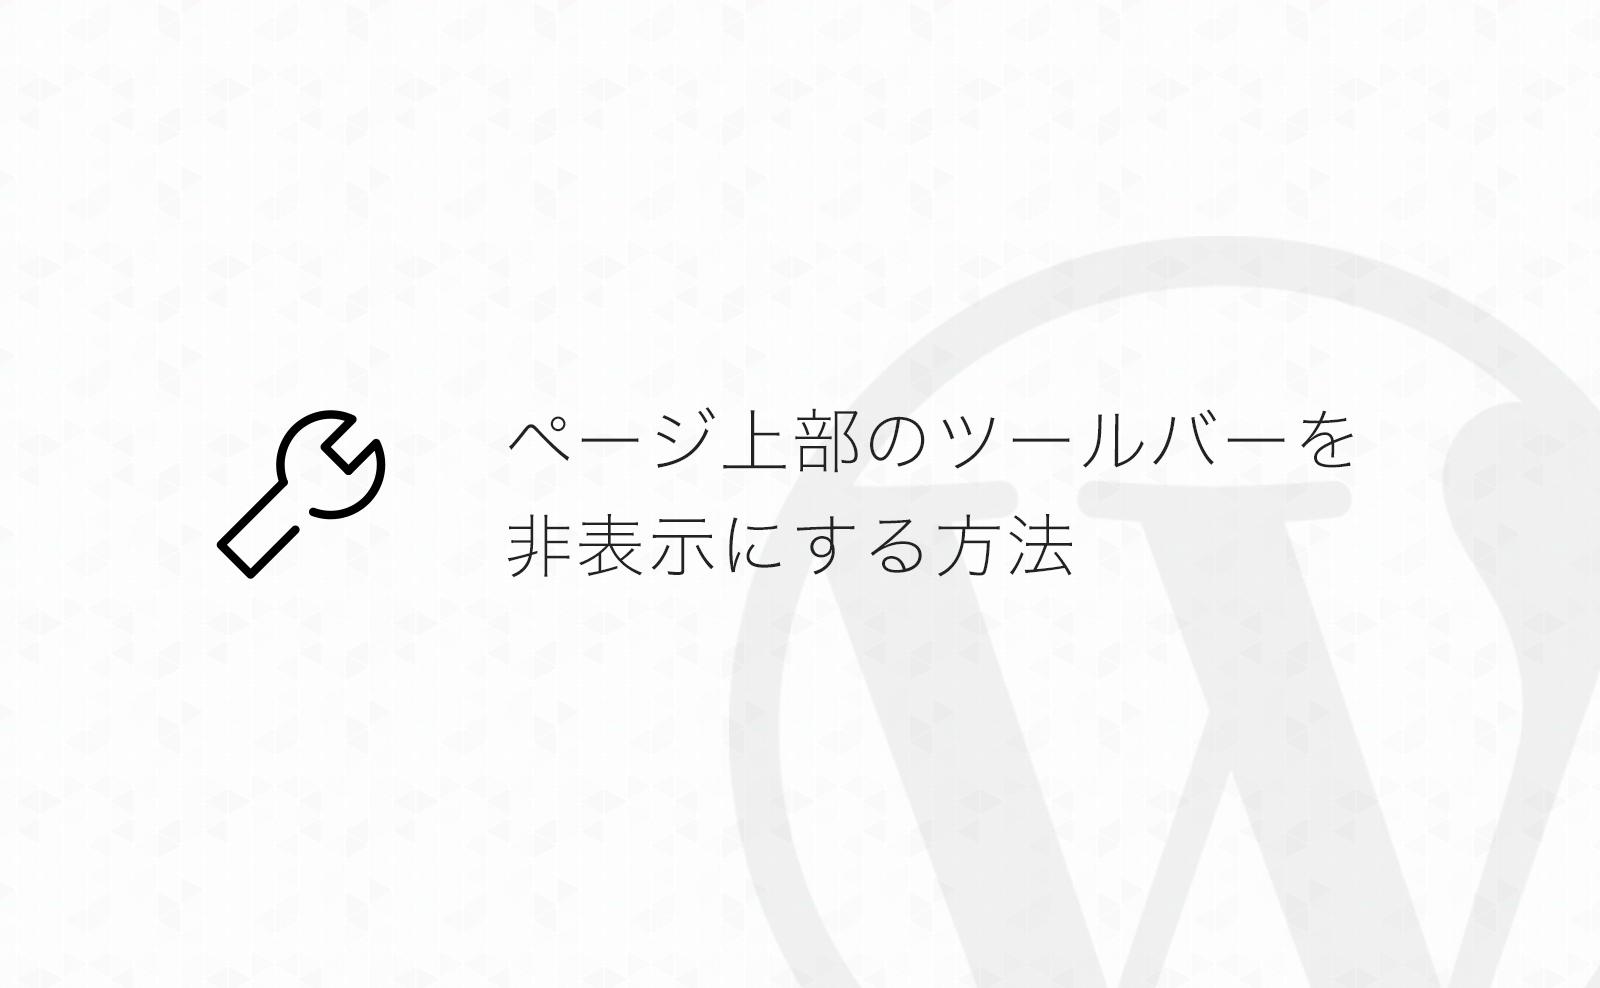 【WordPress】ページ上部の黒い帯(ツールバー)を非表示にする方法